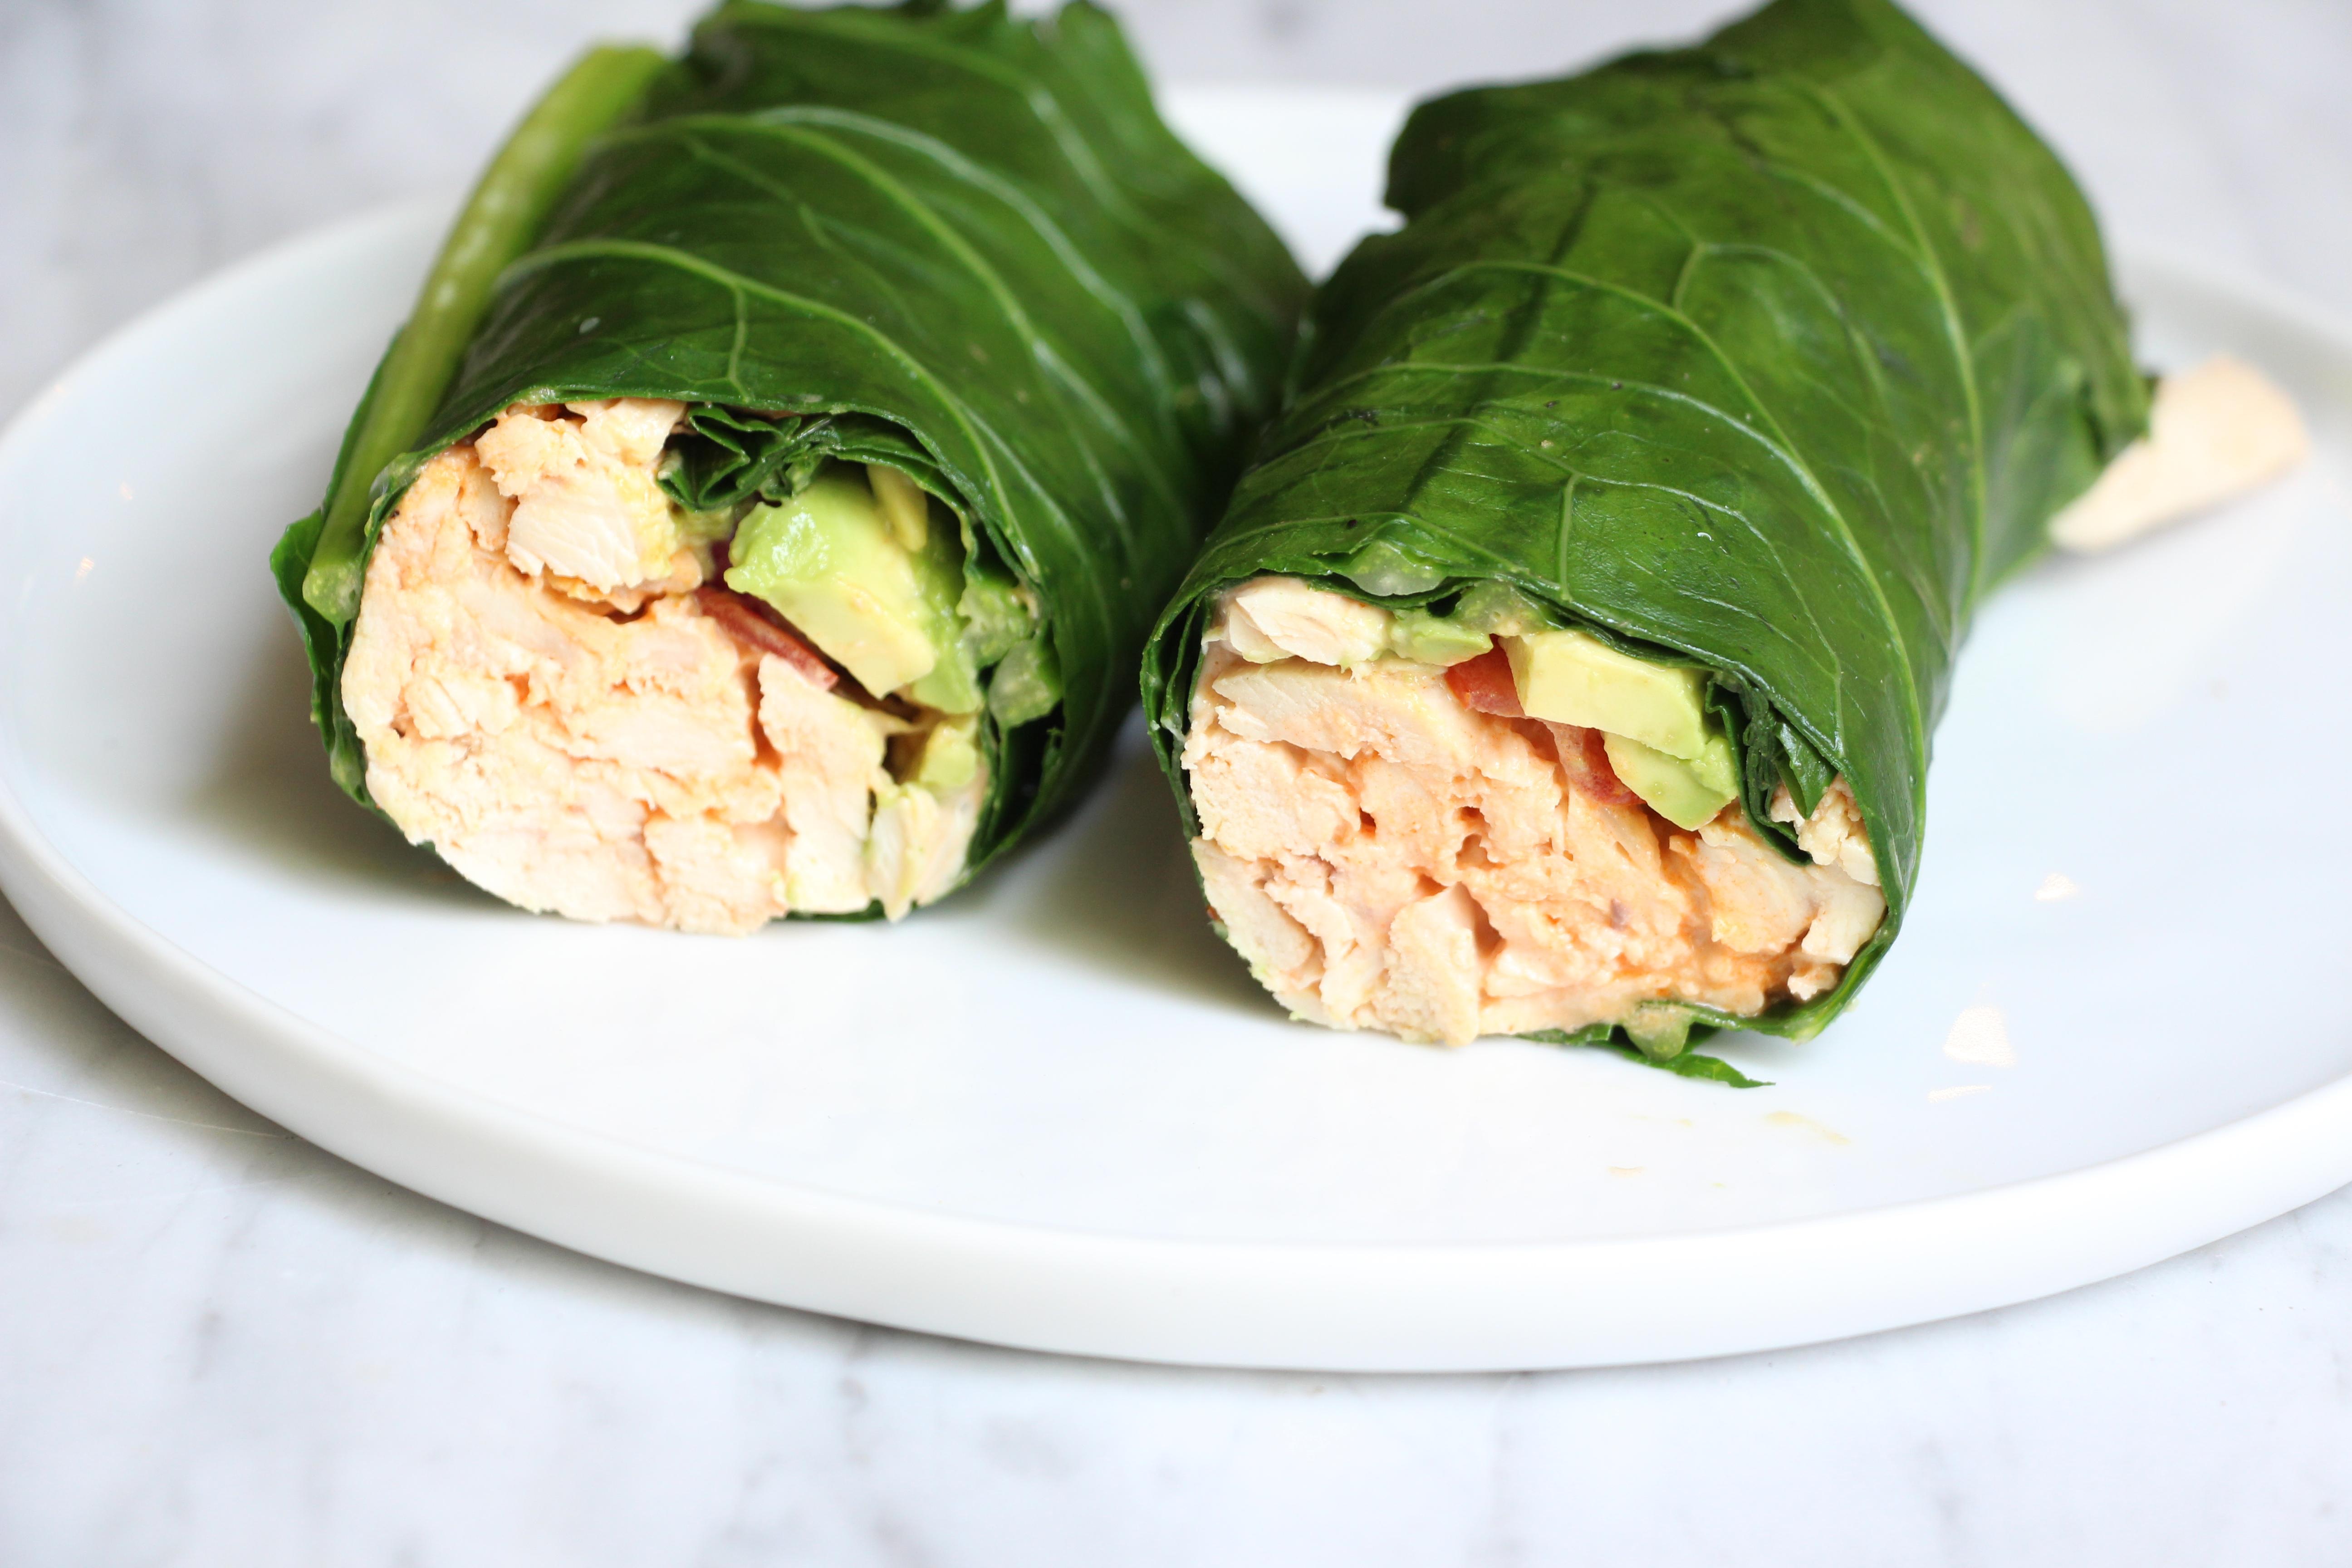 How to Make Perfect Collard Green Wraps